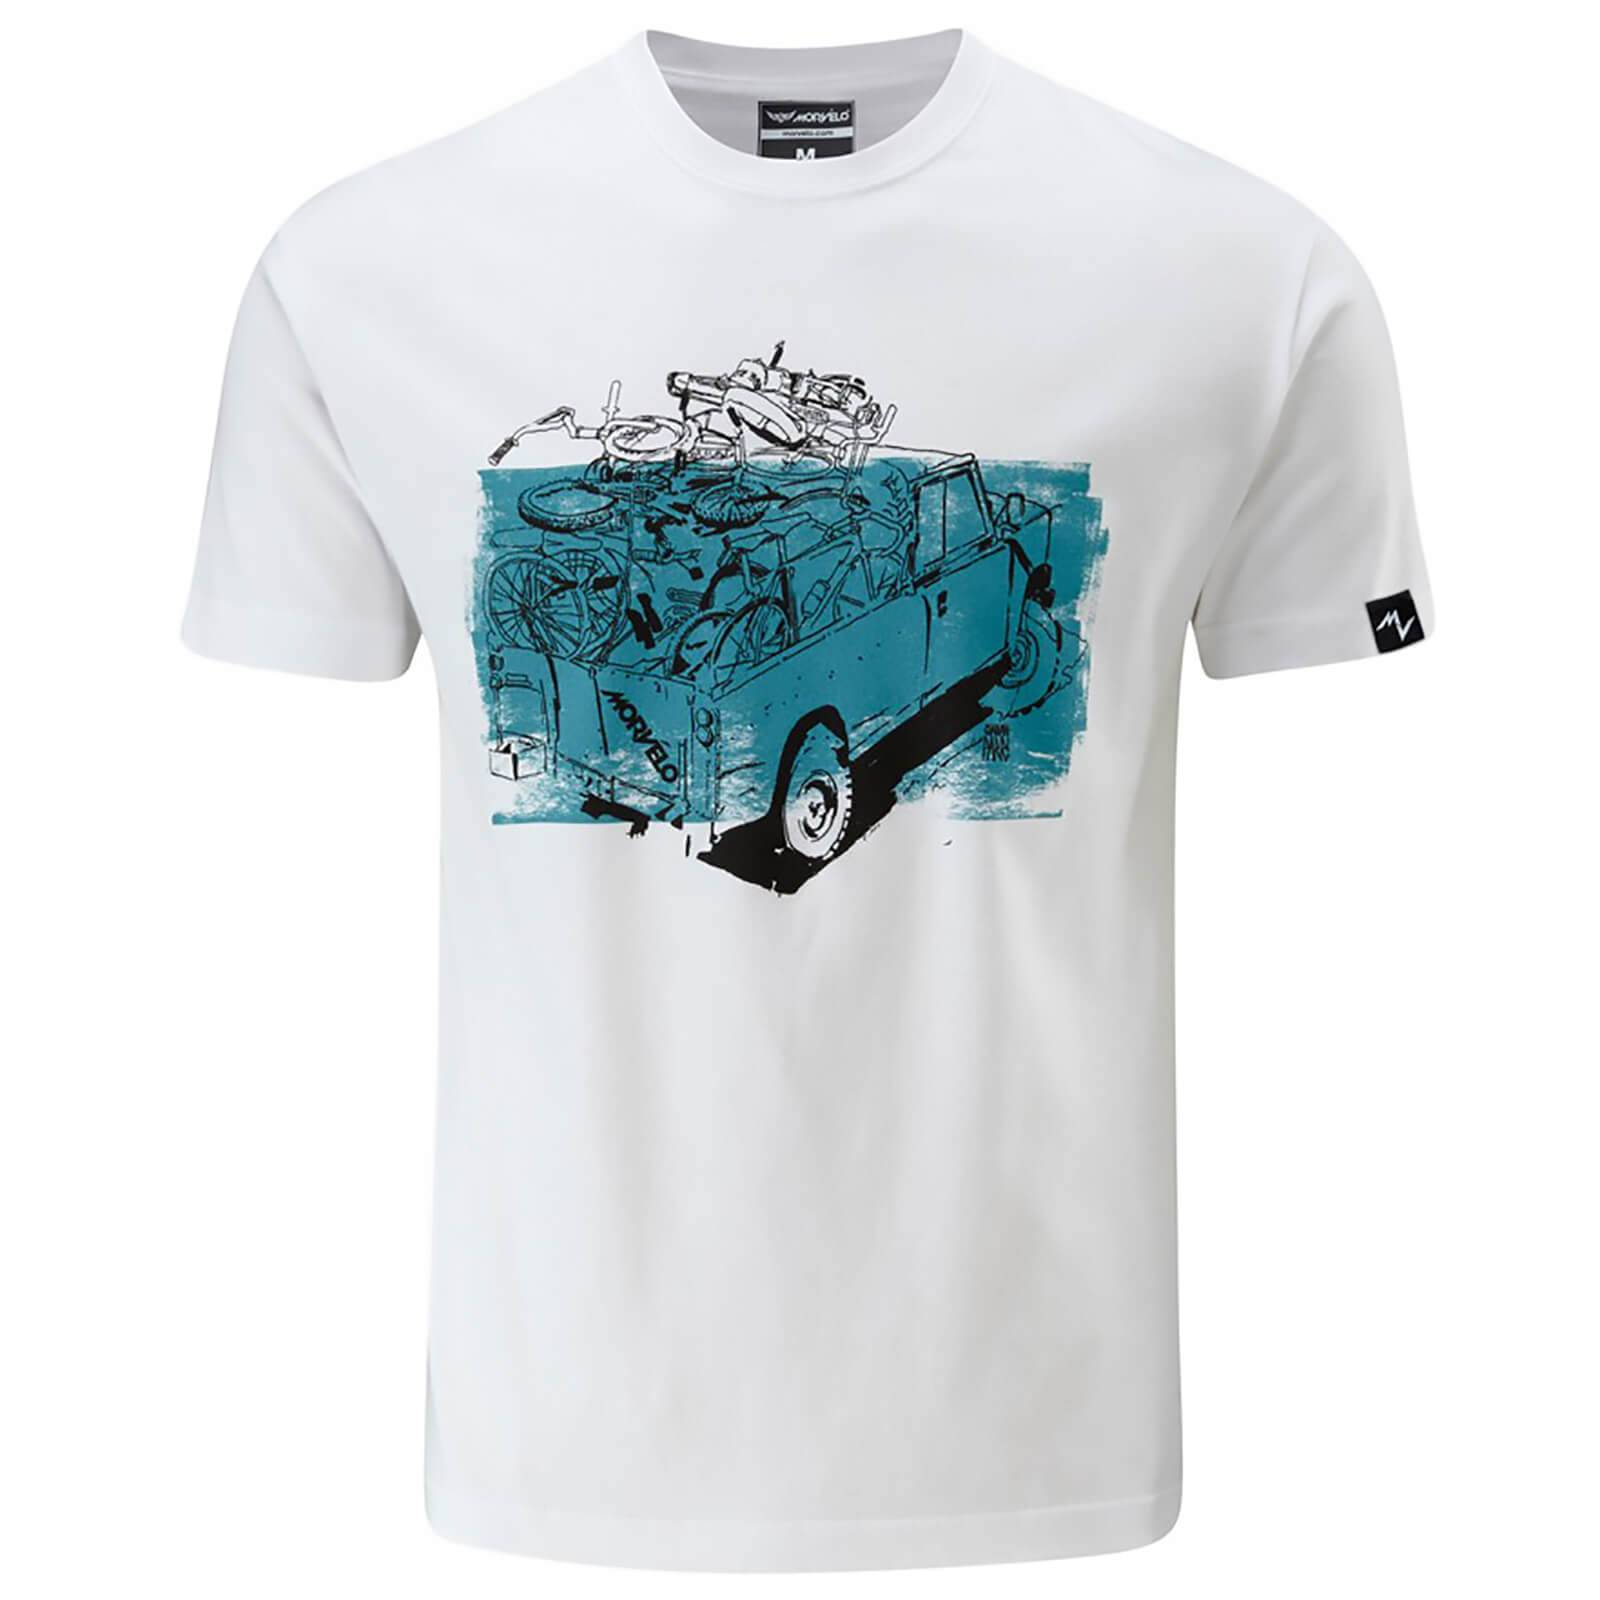 Morvelo T-Shirt - Black - XL - Black